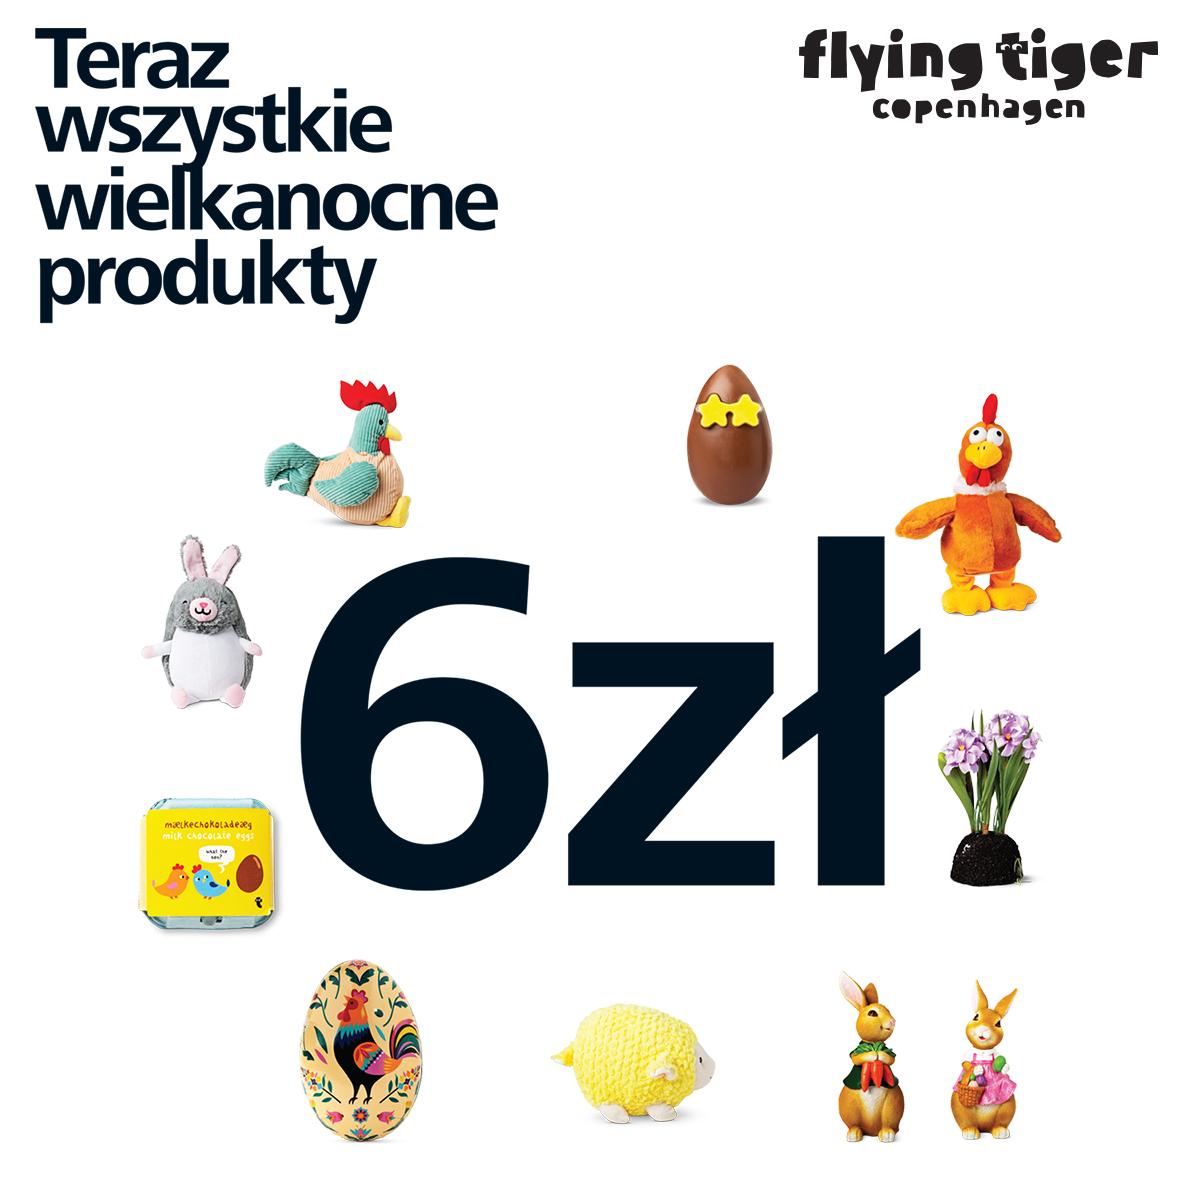 Wiosenne szaleństwo weFlying Tiger Copenhagen!